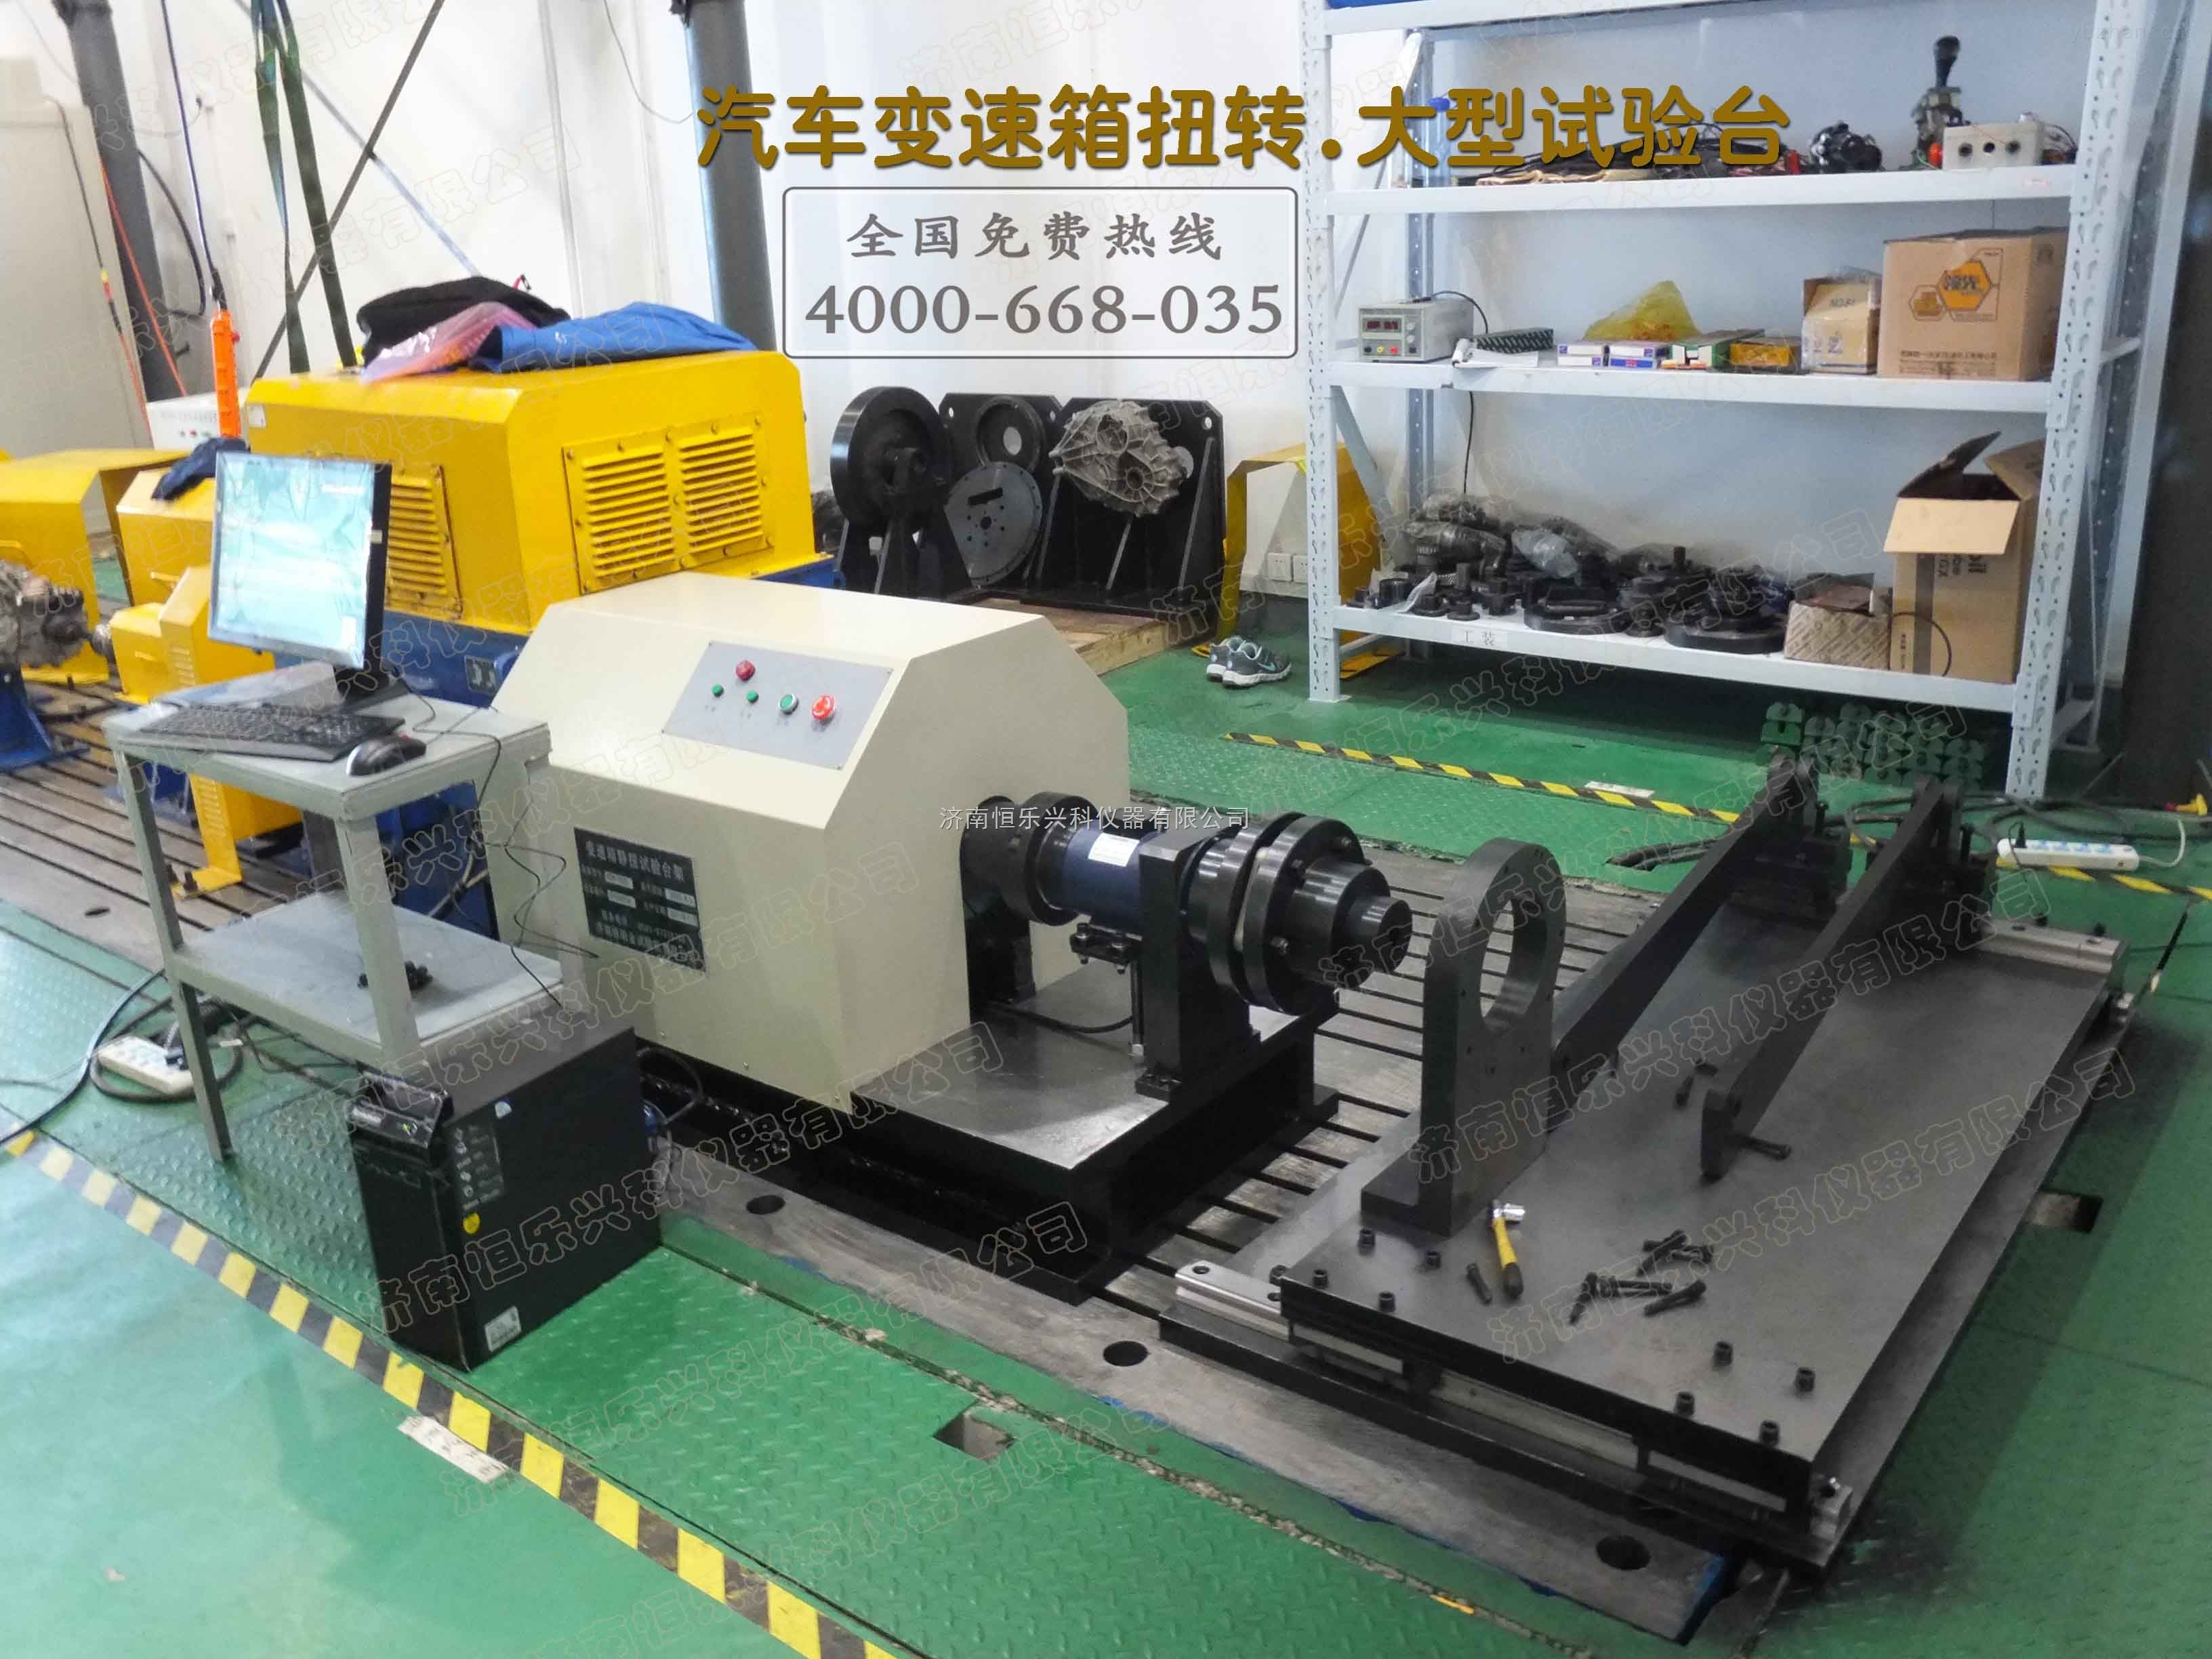 HLNZ-5000N.-微機控制樹脂錨桿扭轉疲勞試驗機恒樂儀器